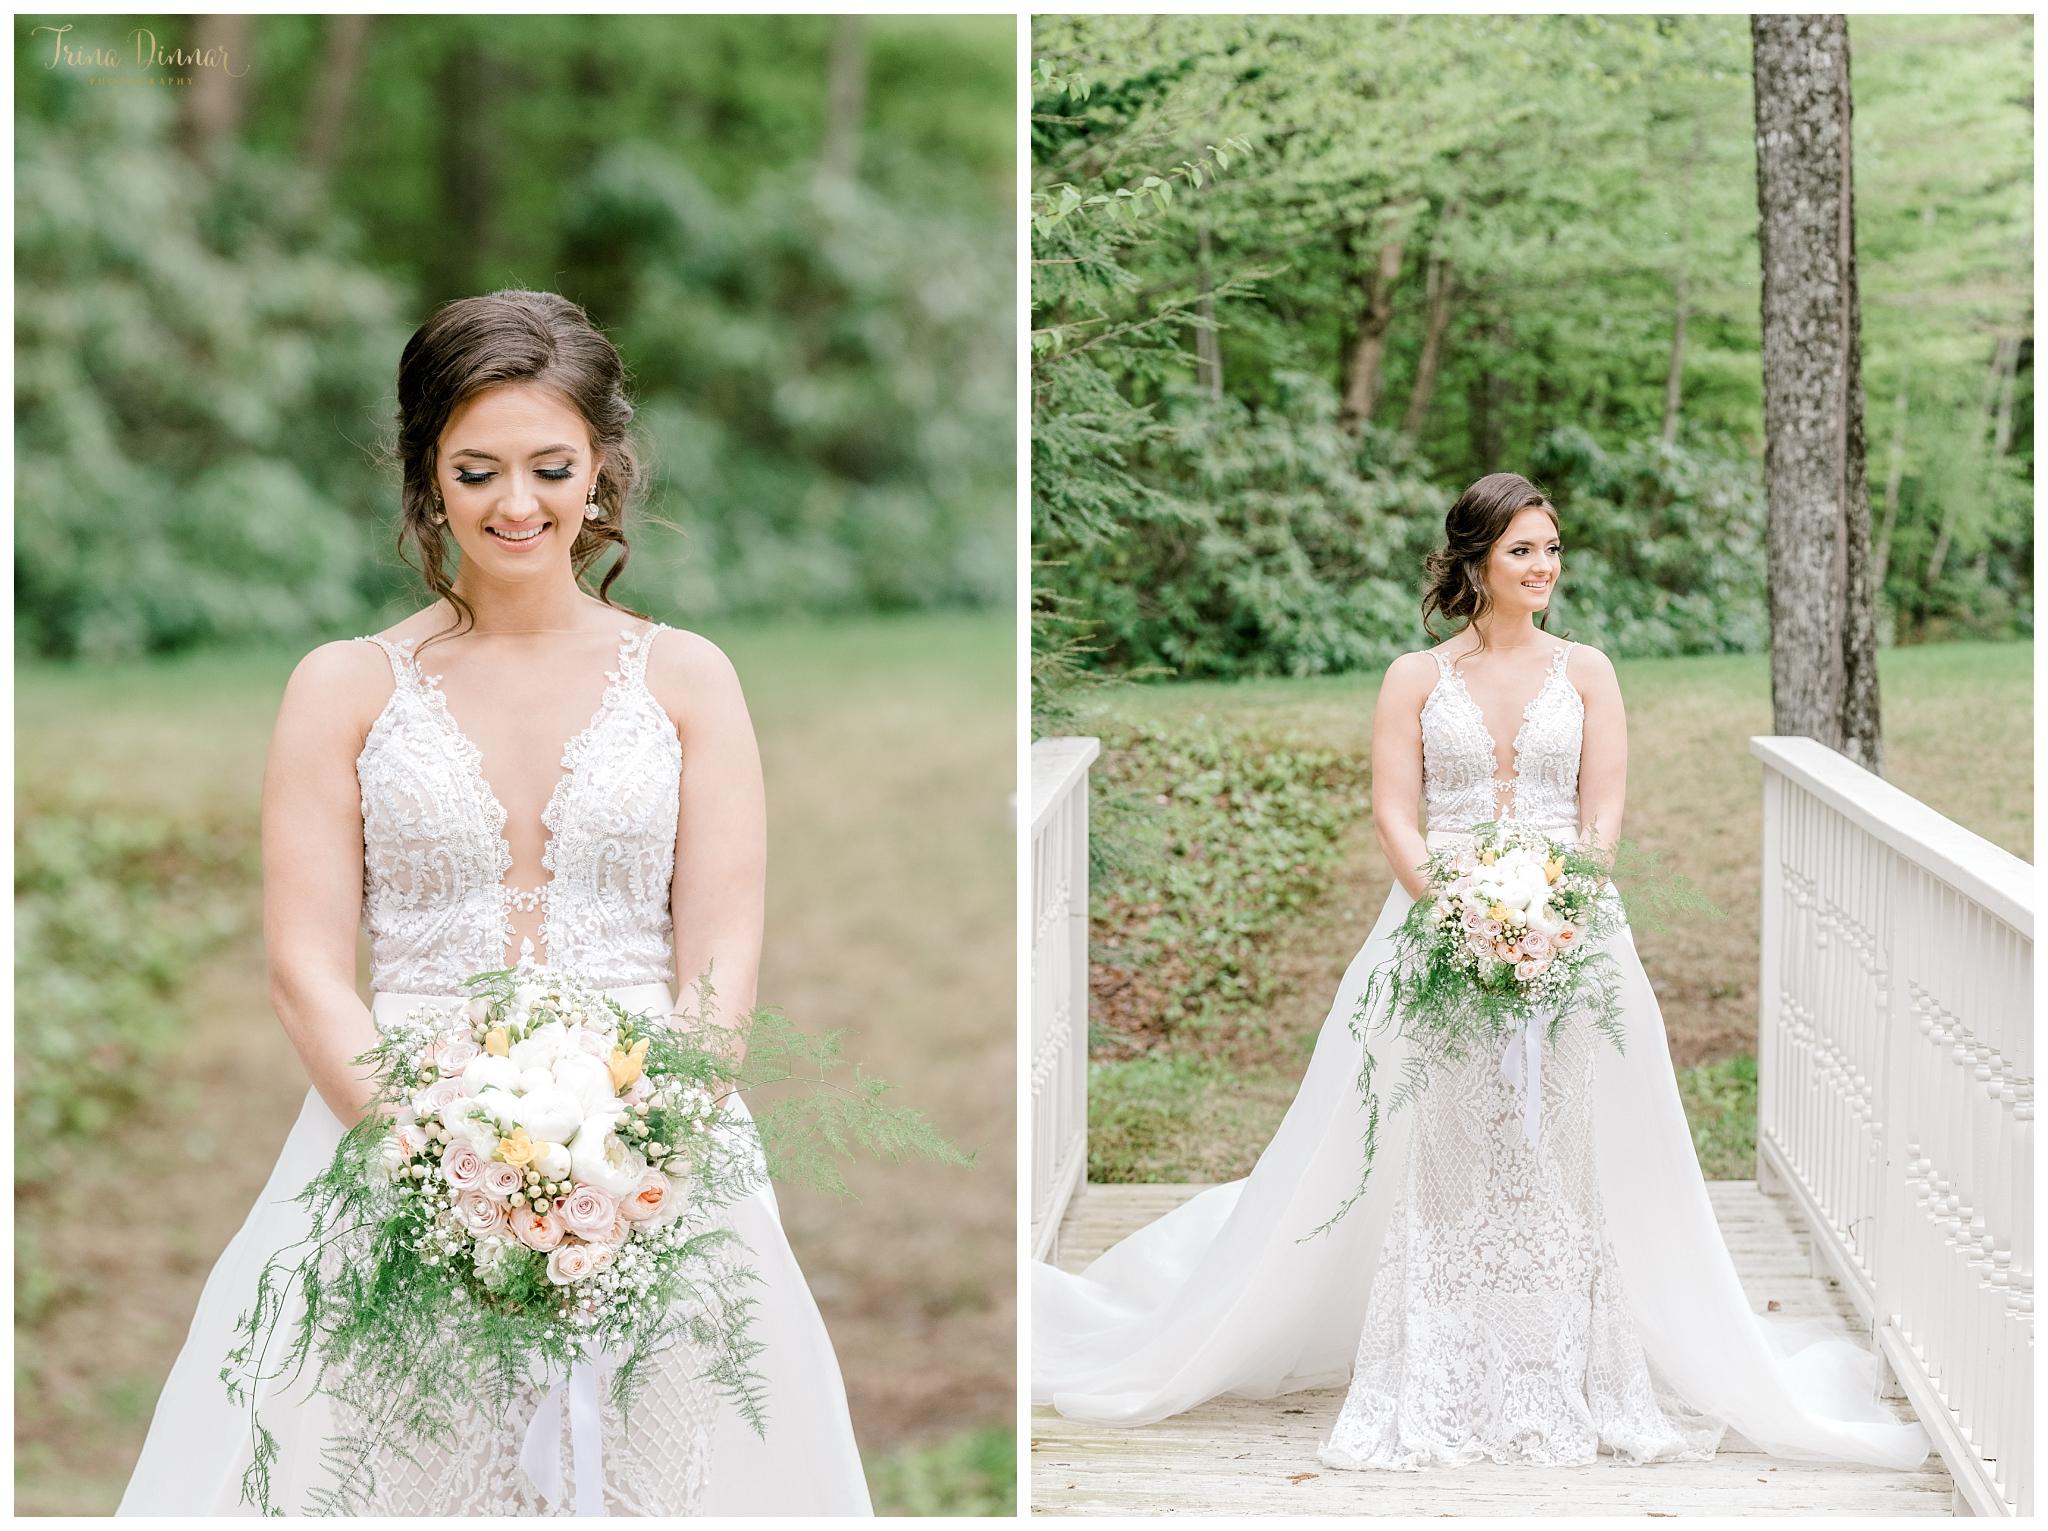 Sunday River Grand Summit Hotel Newry Maine Wedding by Trina Dinnar Photography